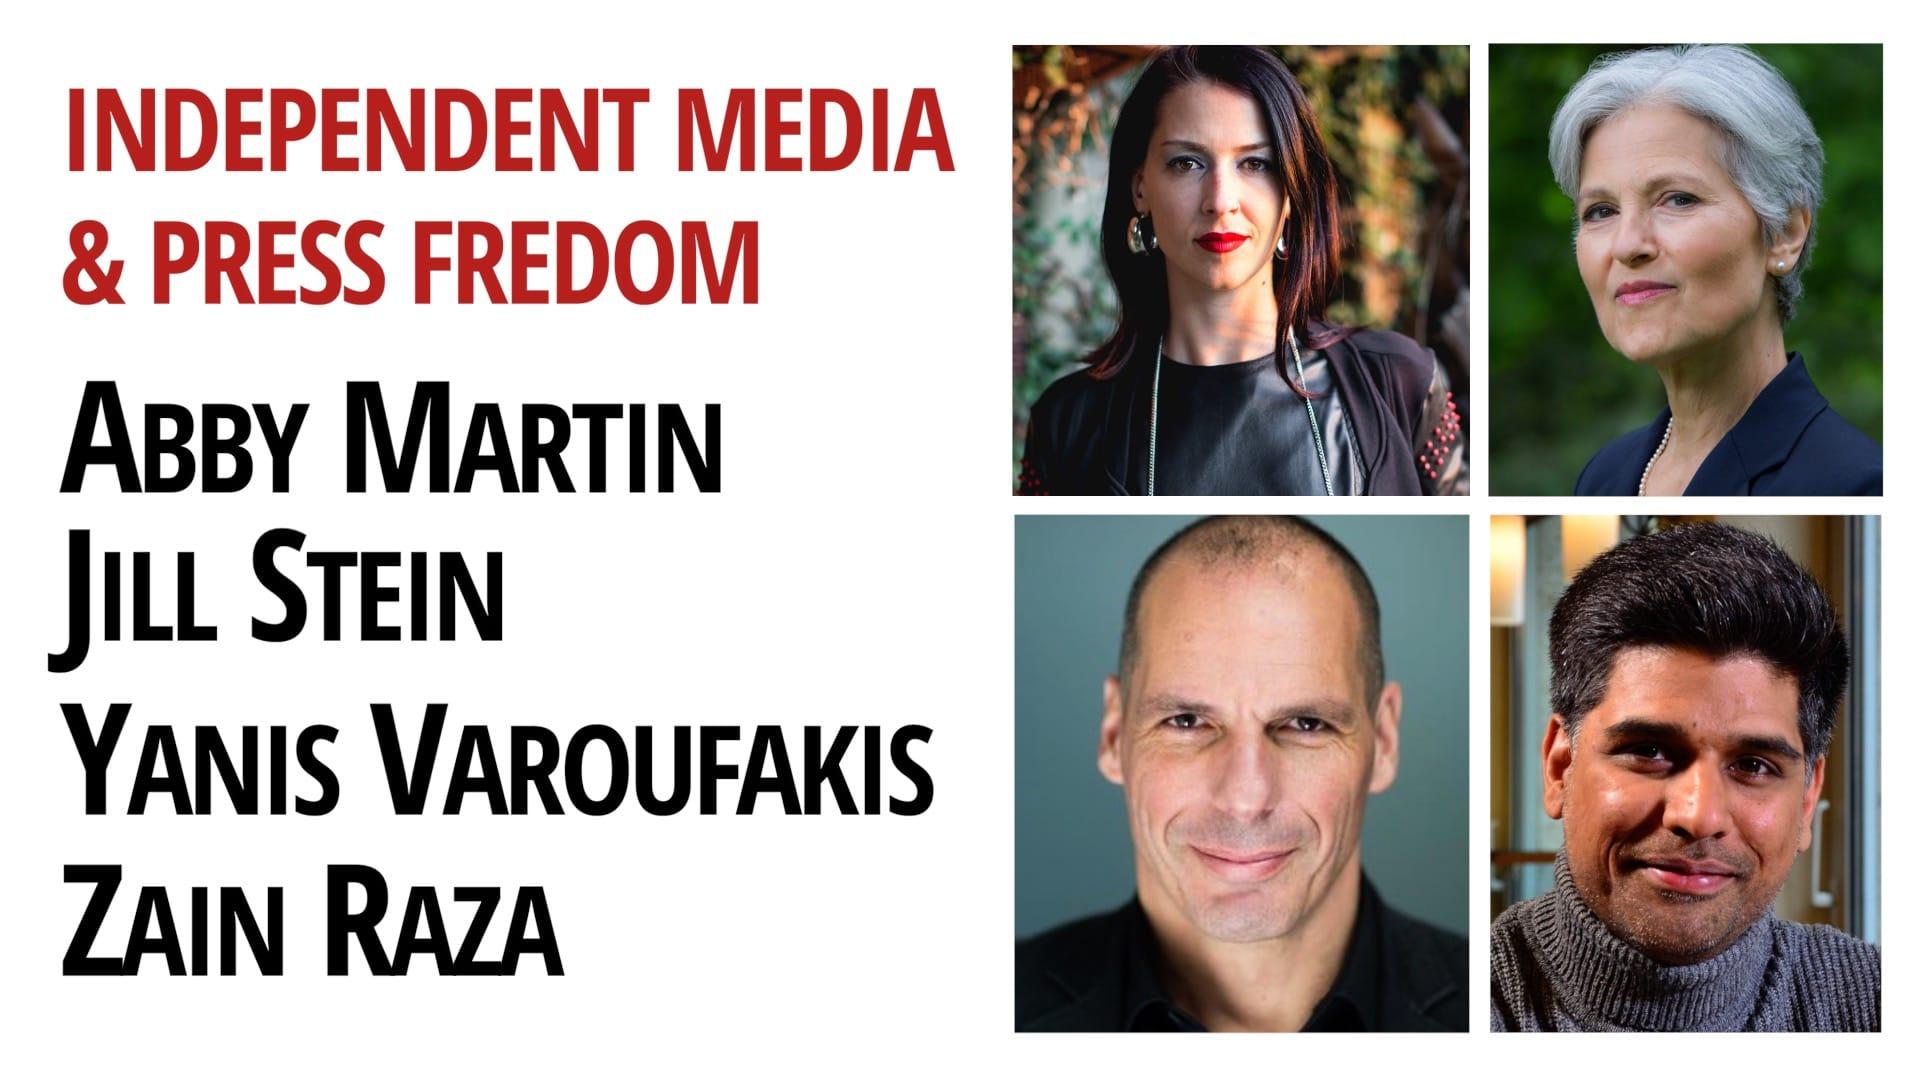 abby martin jill stein yanis varoufakis zain raza press freedom